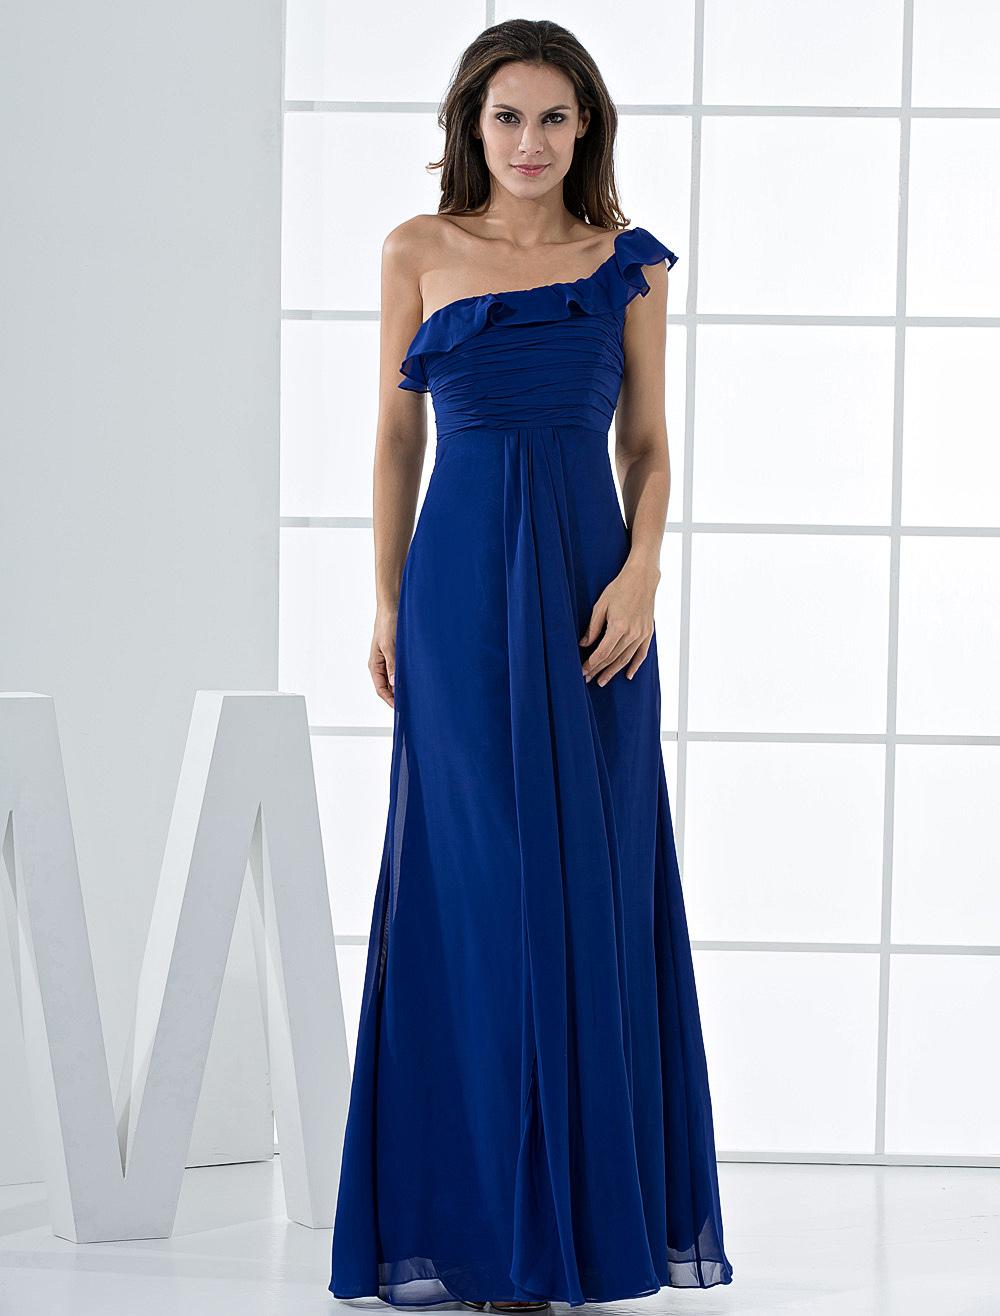 Grace Royal Blue Chiffon One Shoulder Bridesmaid Dress (Wedding Bridesmaid Dresses) photo